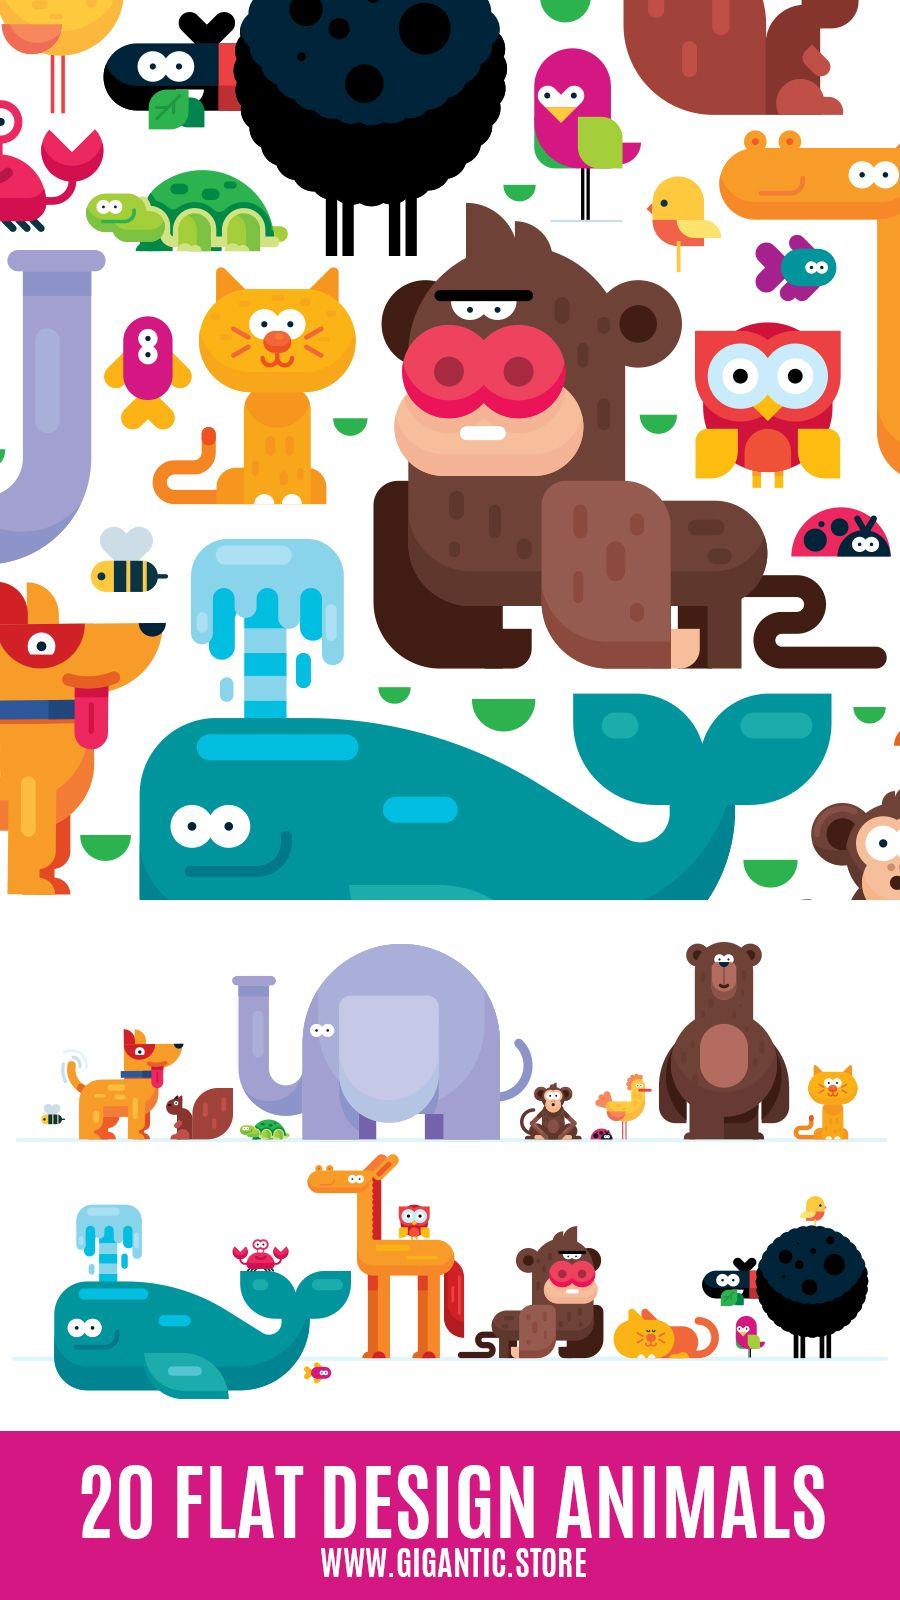 20 Flat Design Animals Download Vector Files Animal Icon Design Pixel Art Design Flat Design